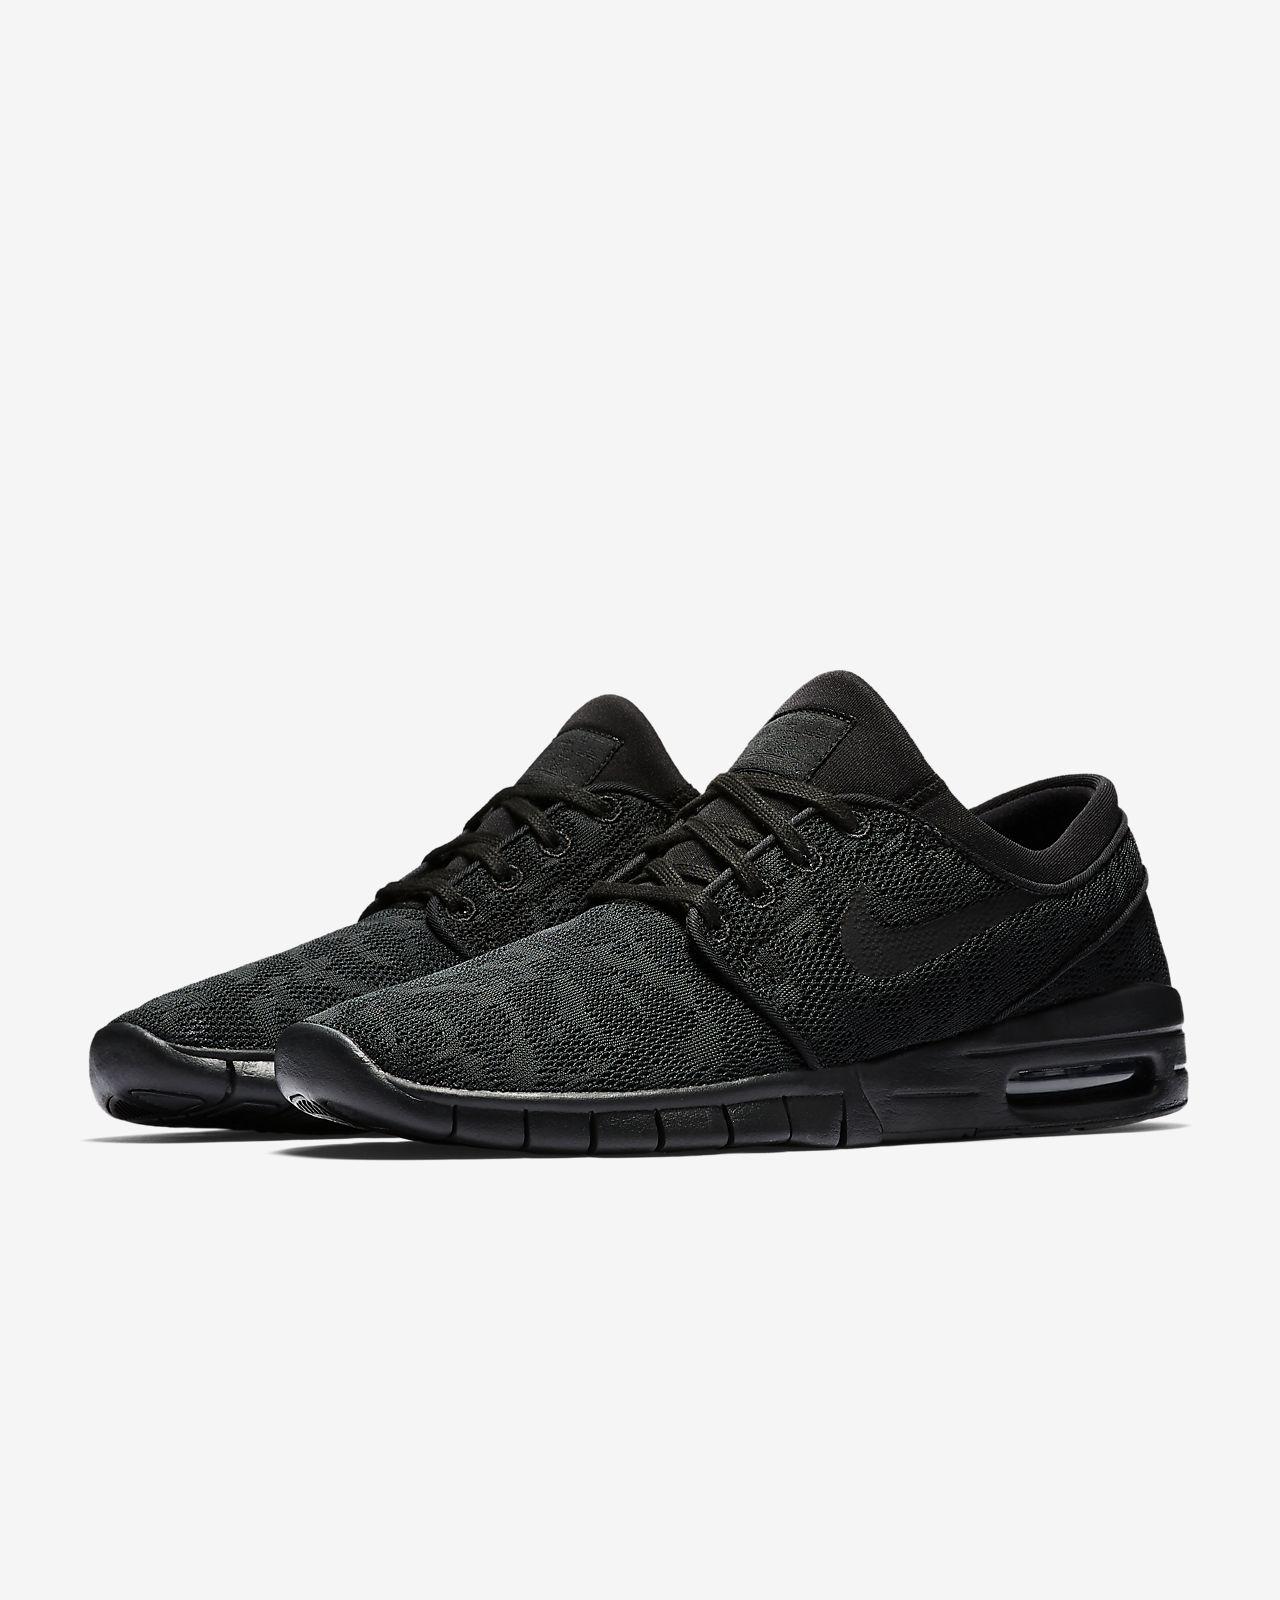 Nike SB Janoski Air Max Black & Camo Mesh Skate Shoes